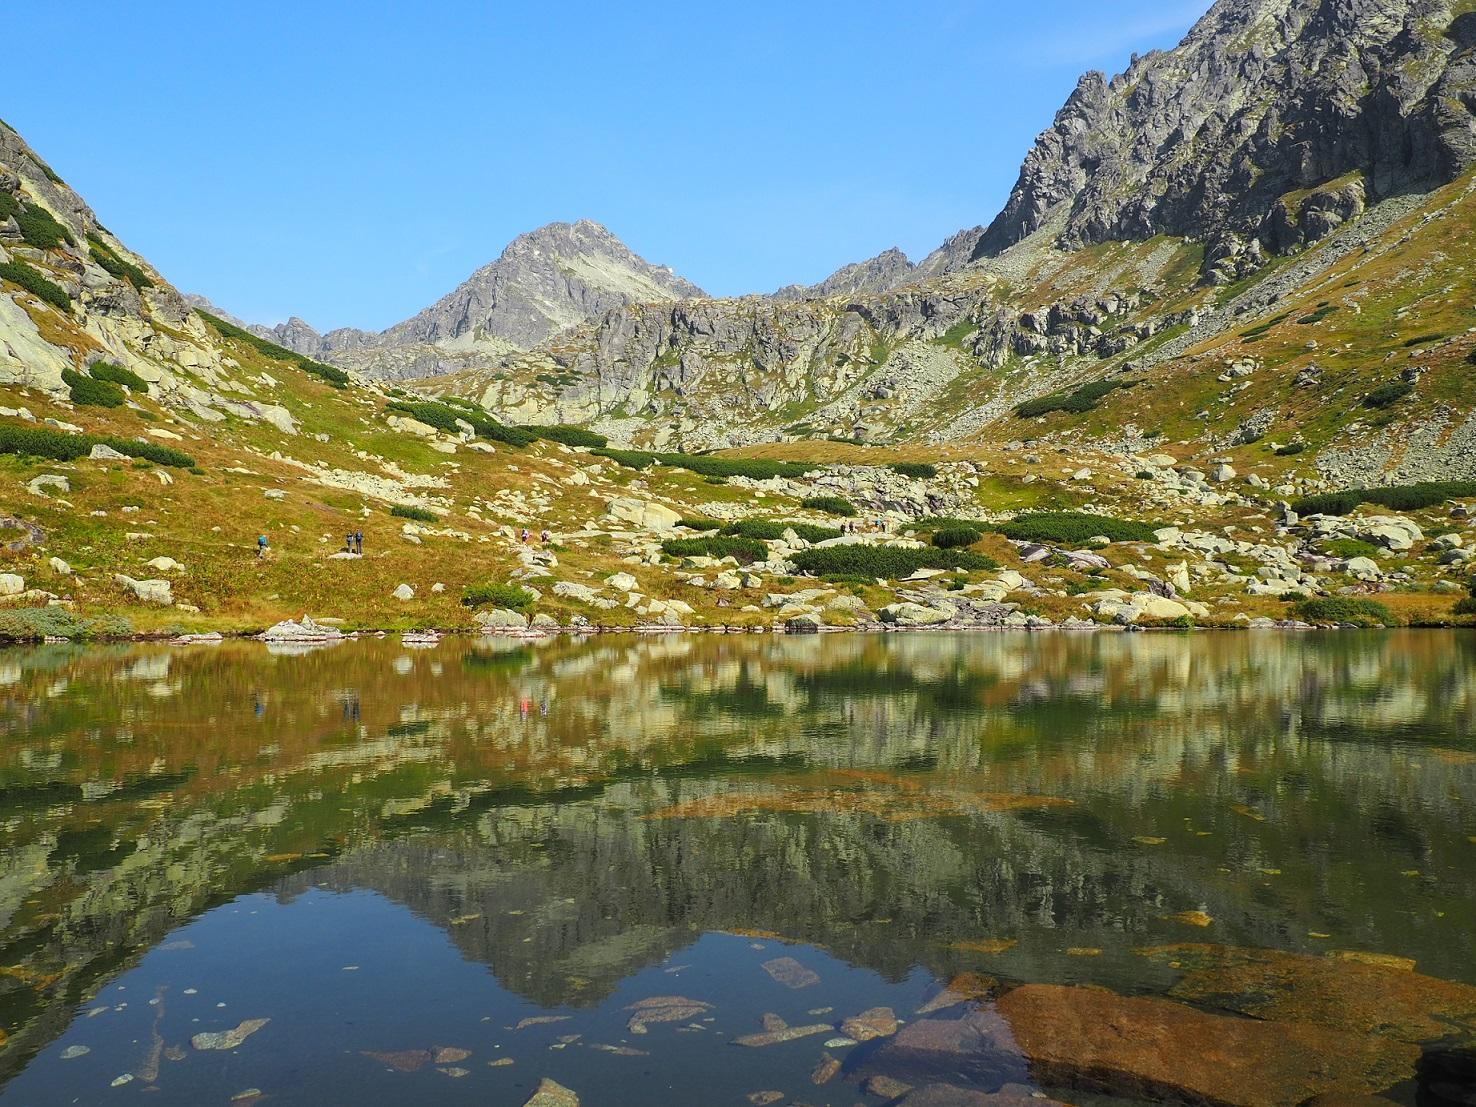 Tatras Slovaquie Slovaquia - Pleso nad Skokom